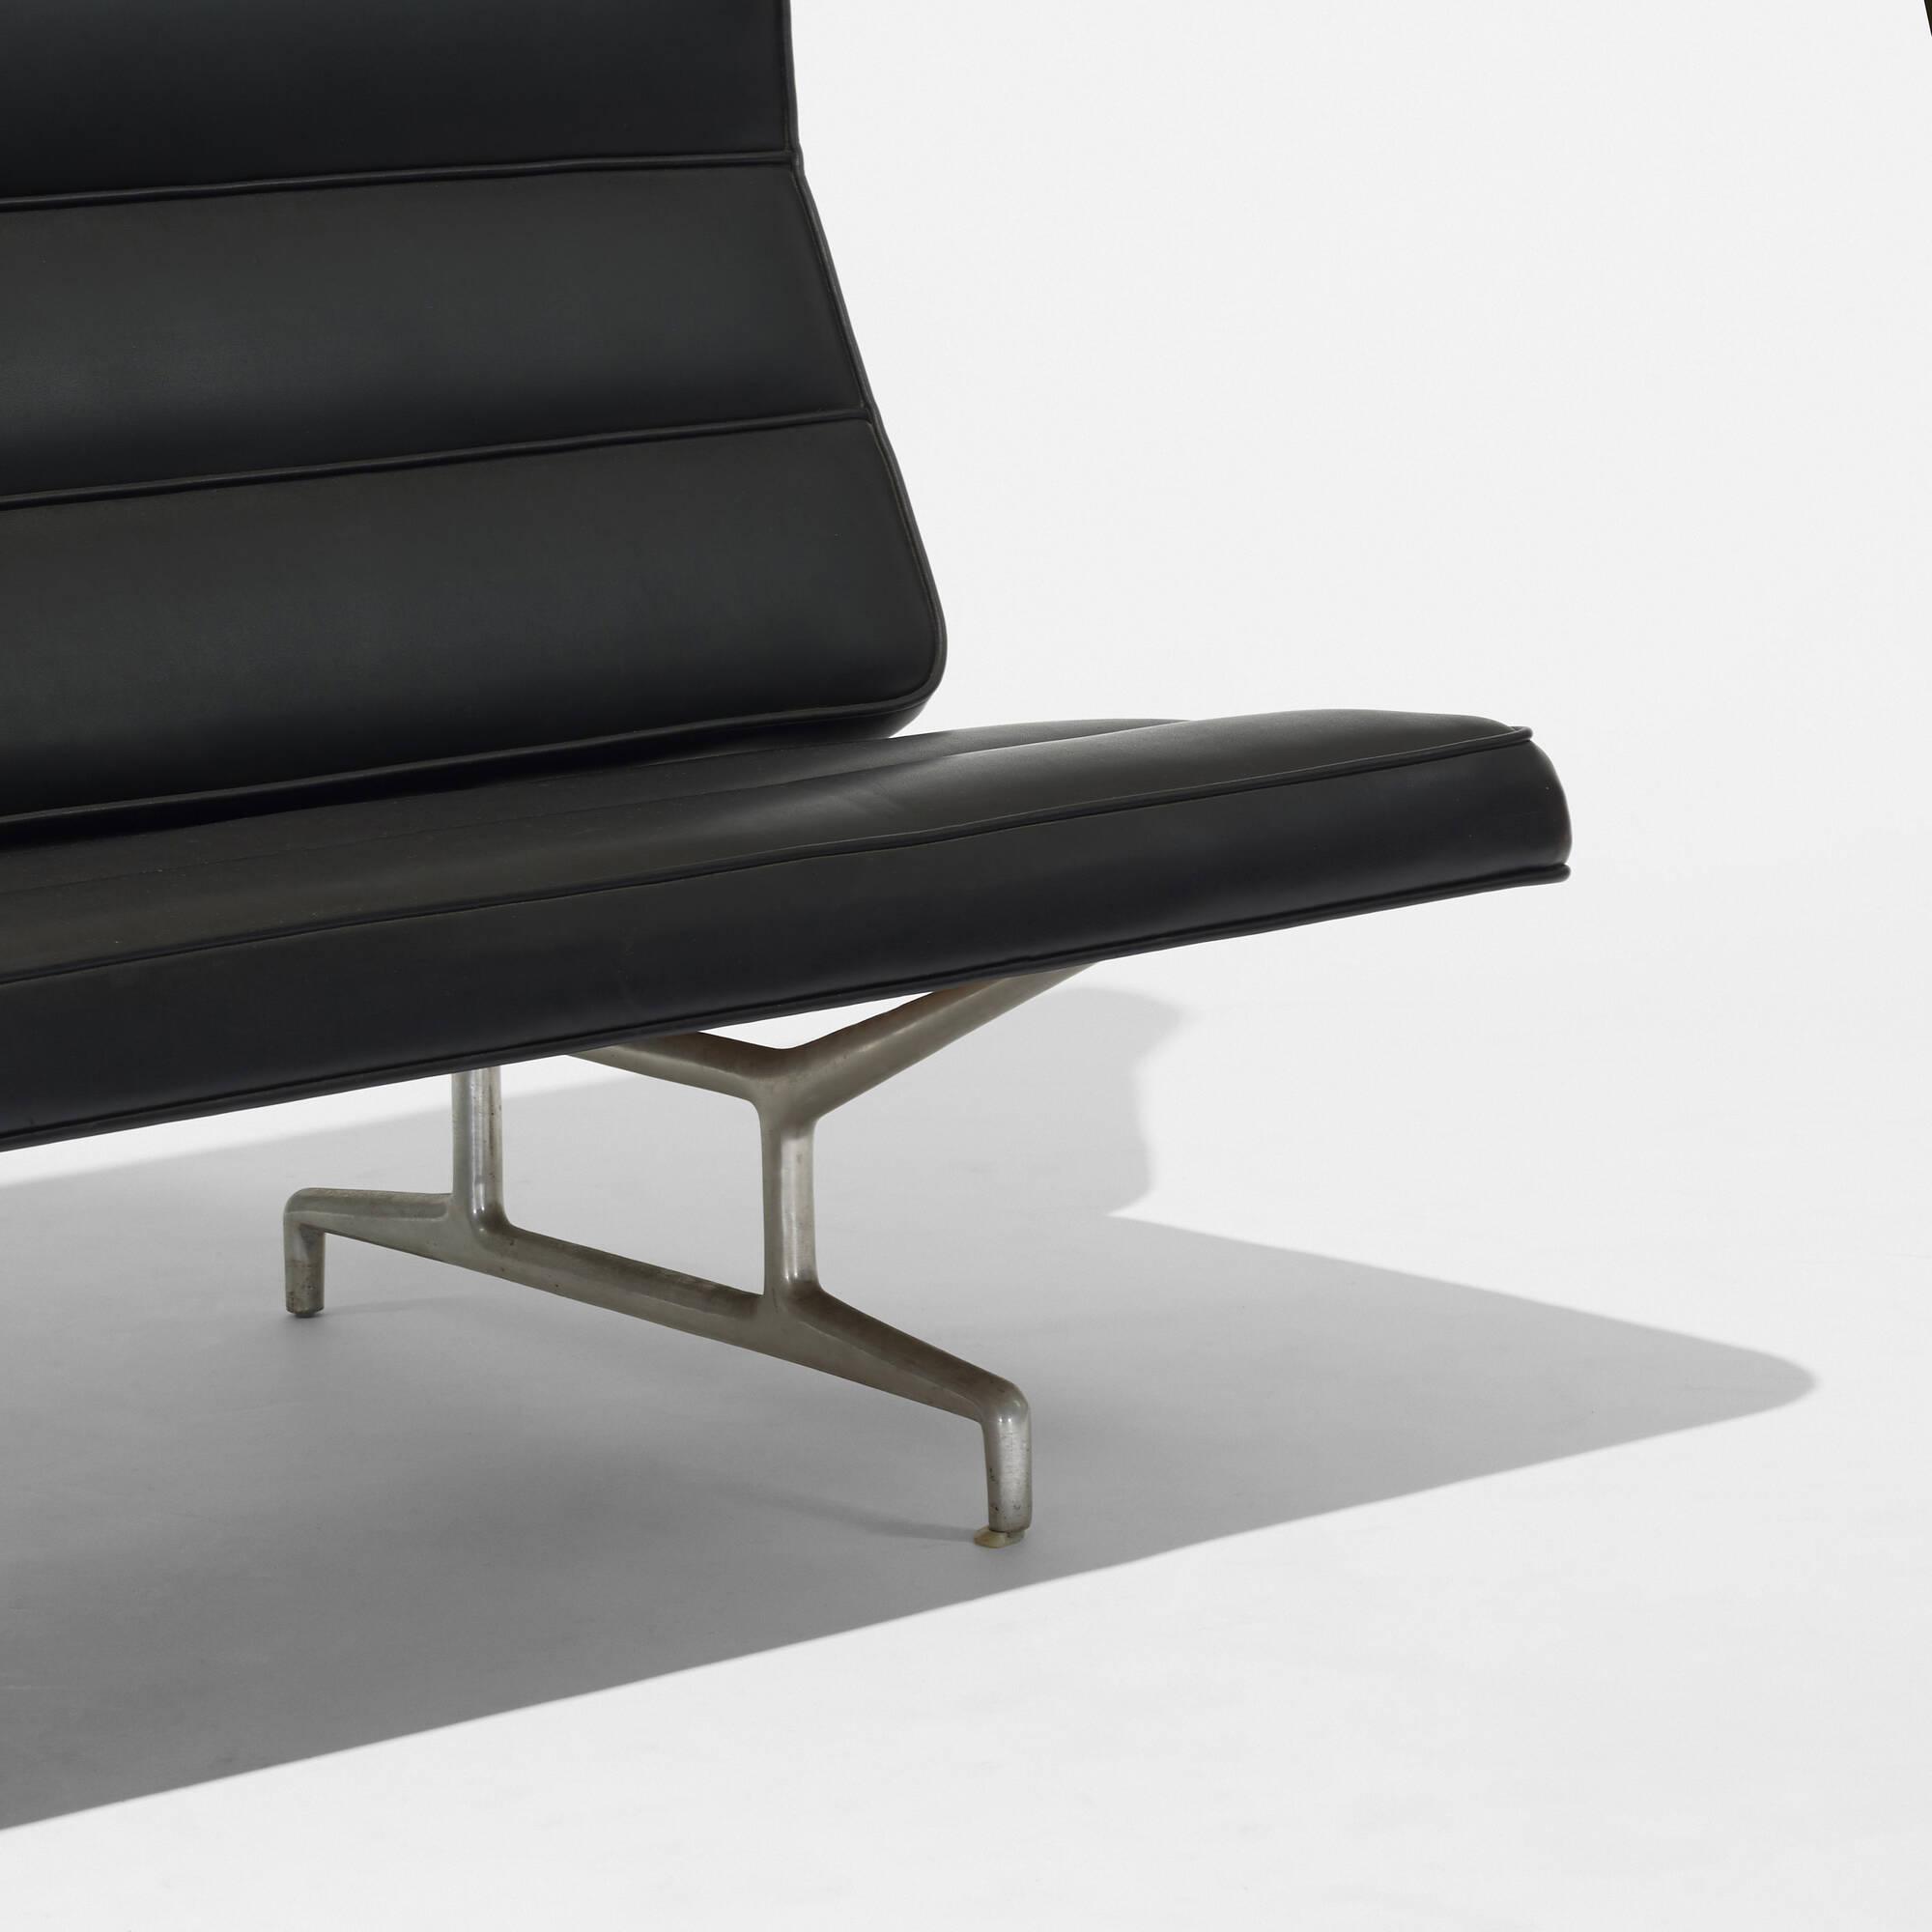 ... 236: Charles And Ray Eames / Sofa, Model 3473 (3 Of 3)